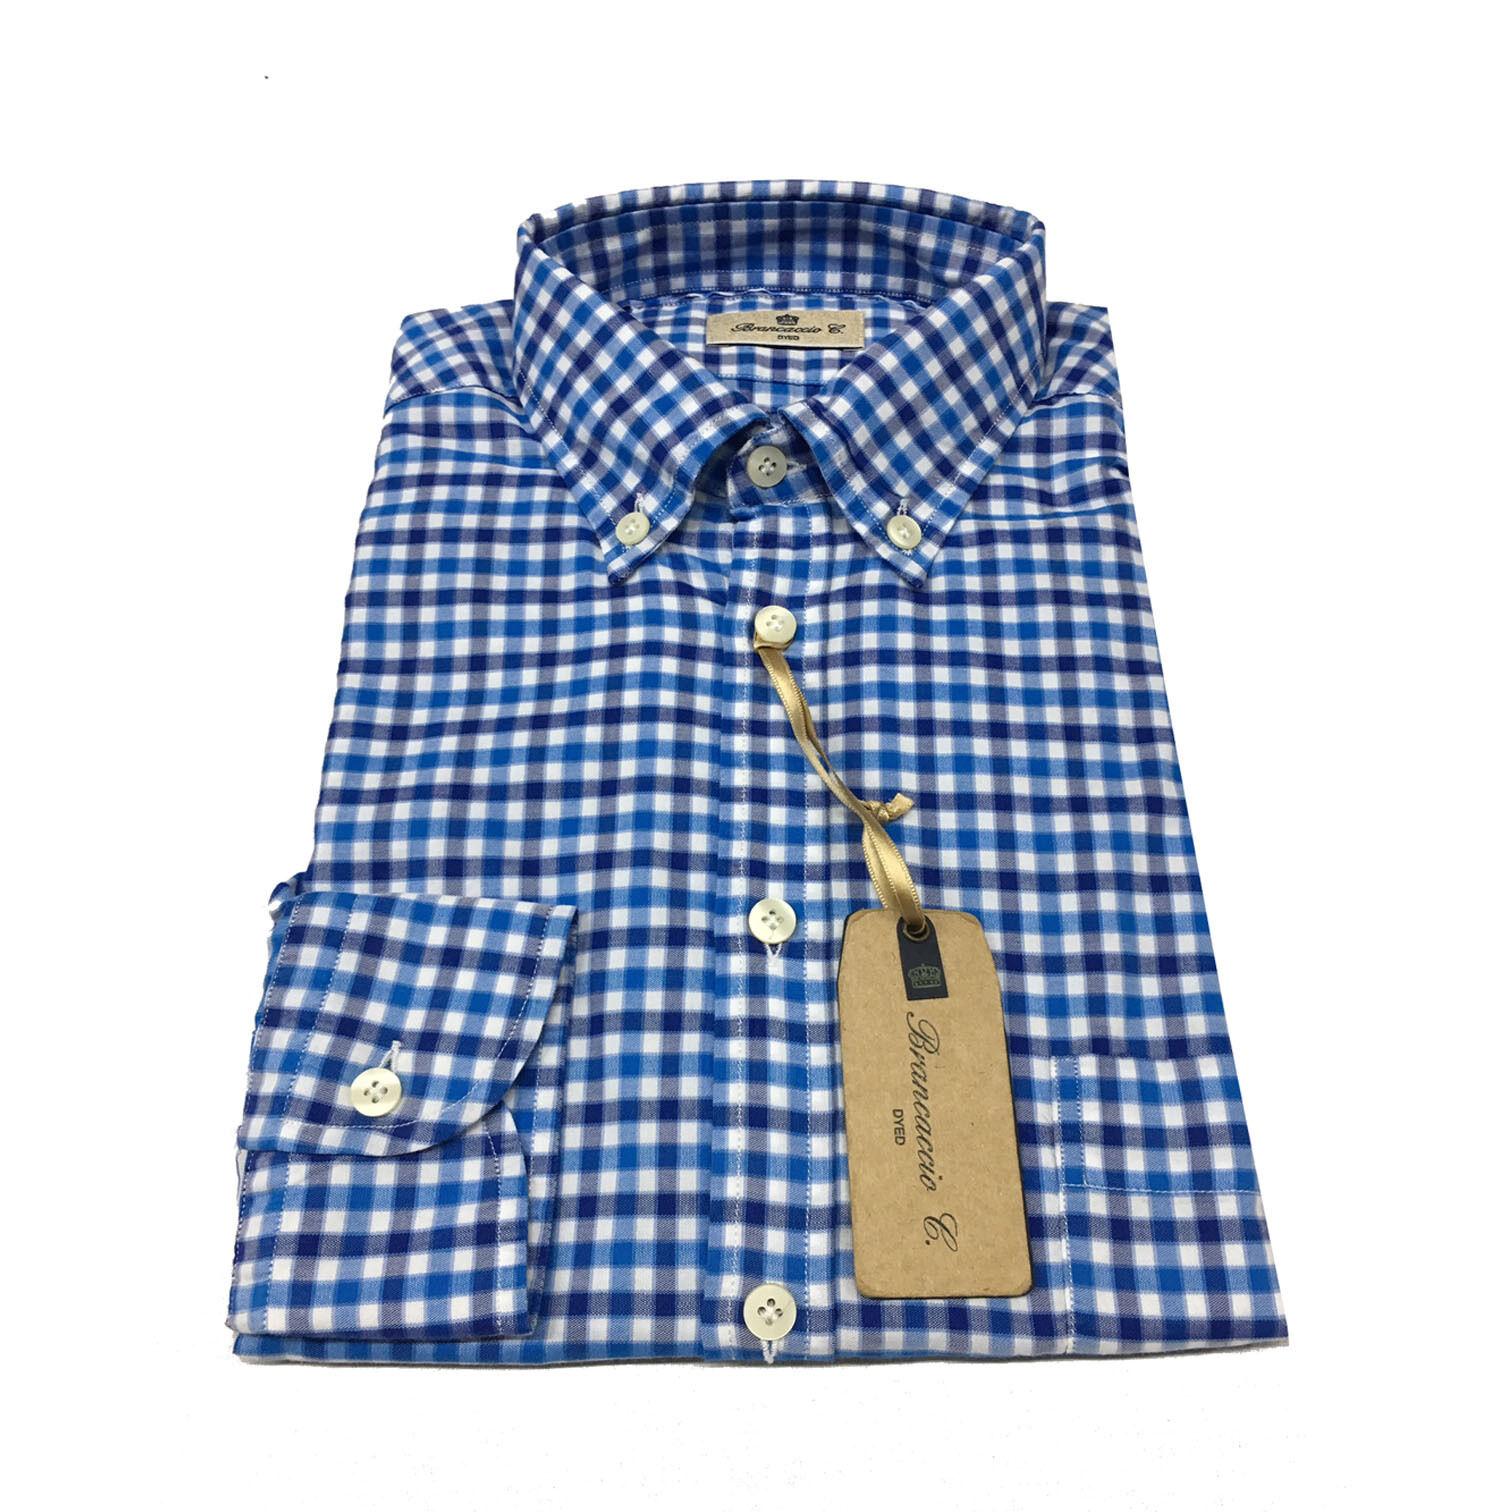 BRANCACCIO herren langarm-shirt kader blue blue 100% baumwolle weste komfortabel